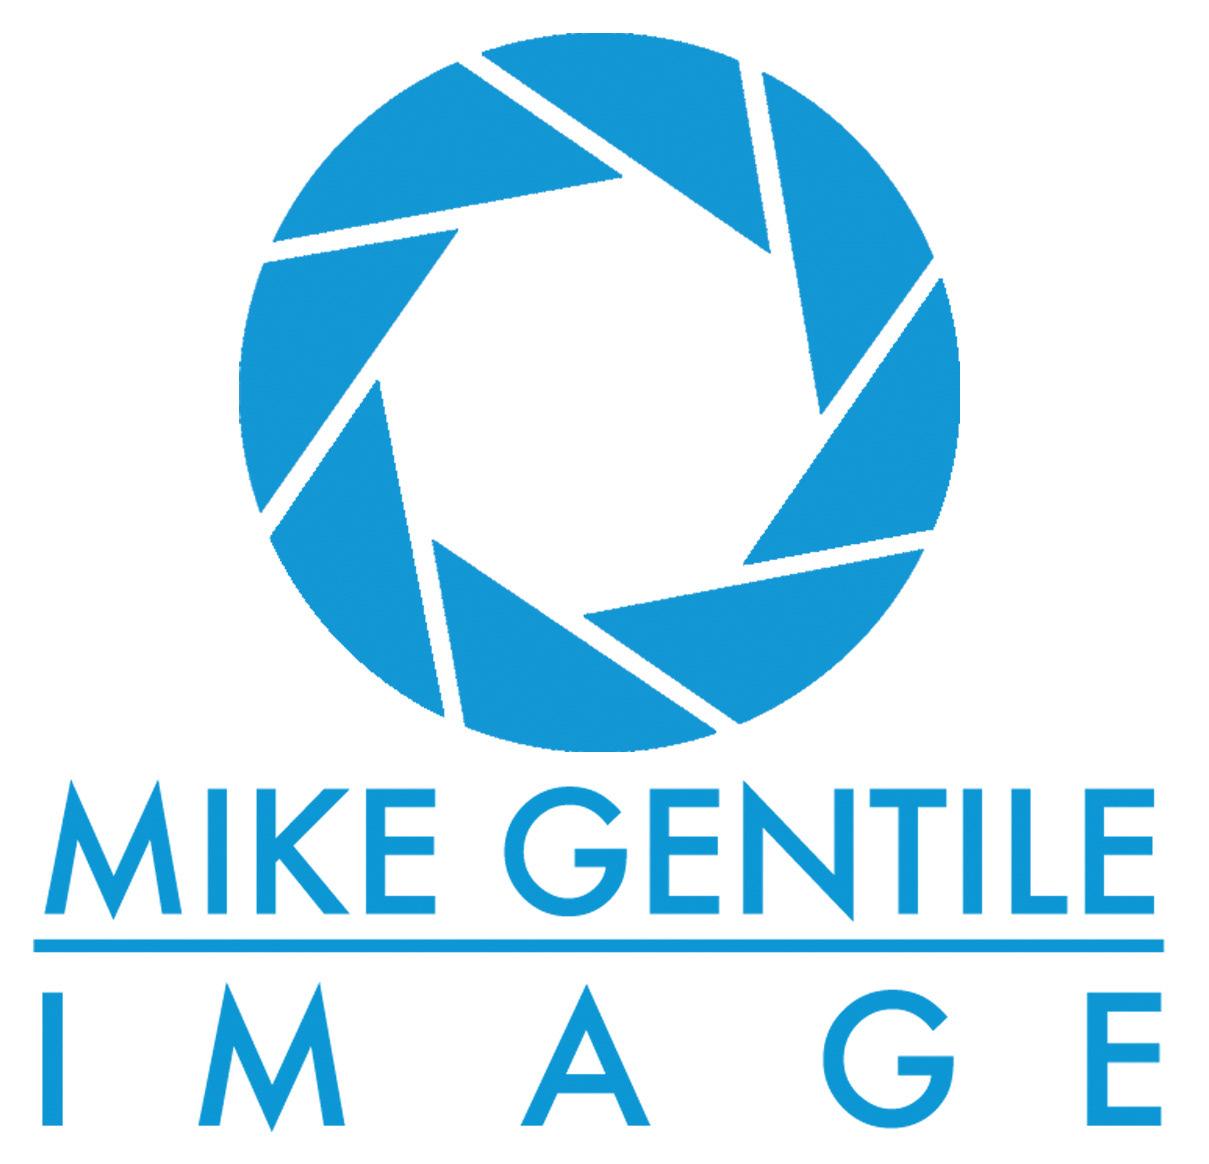 Michael Gentile Image